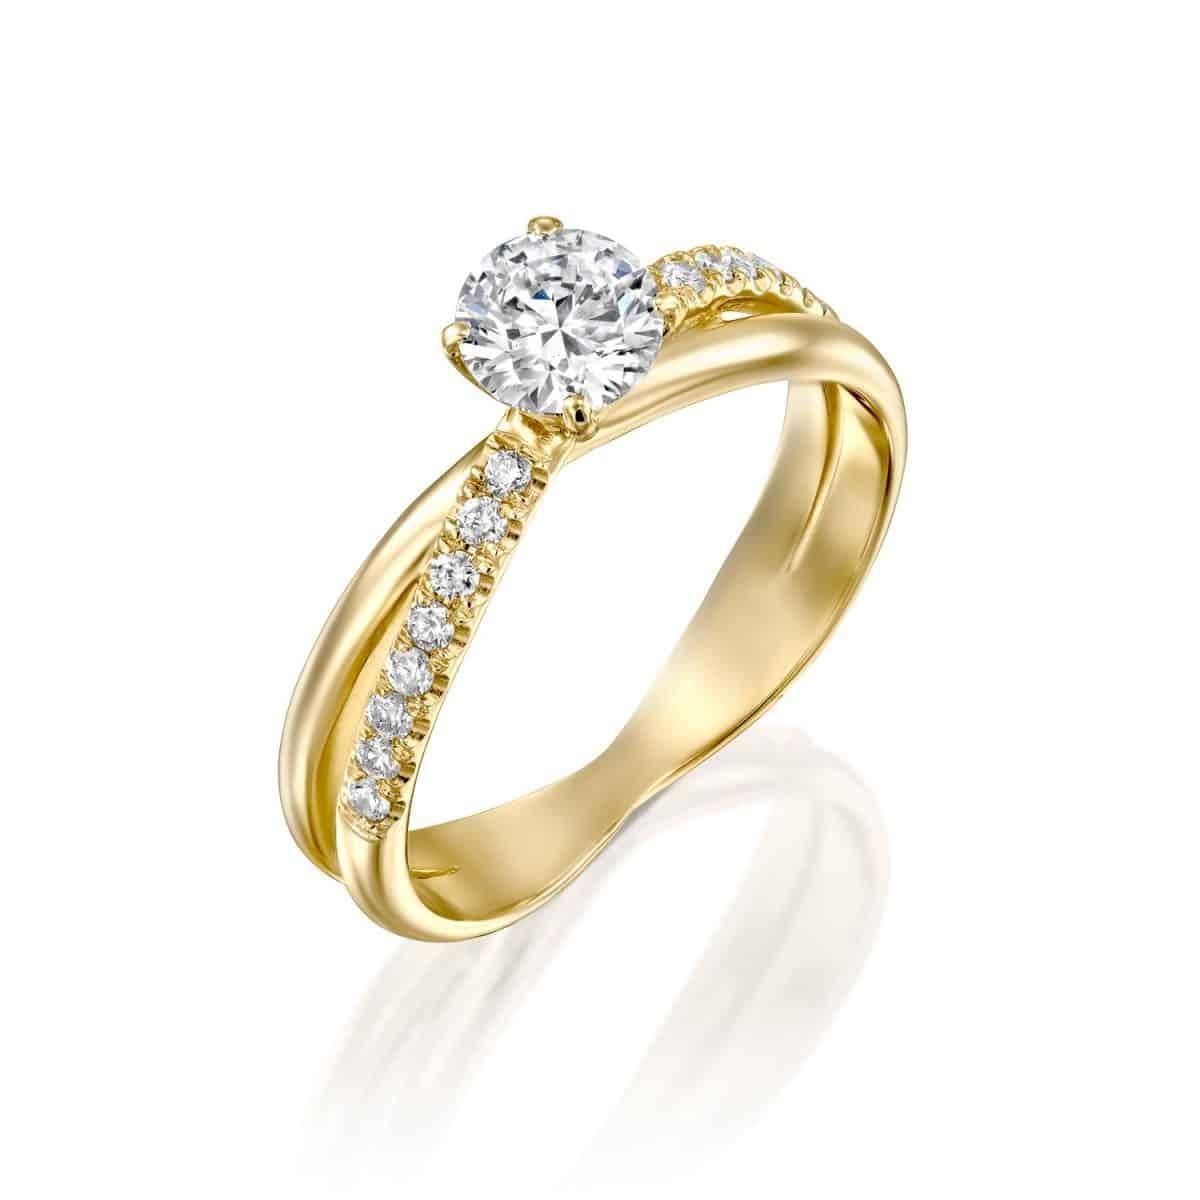 Monique - Twist Yellow Gold Lab Grown Diamond Engagement Ring 0.41ct. - main